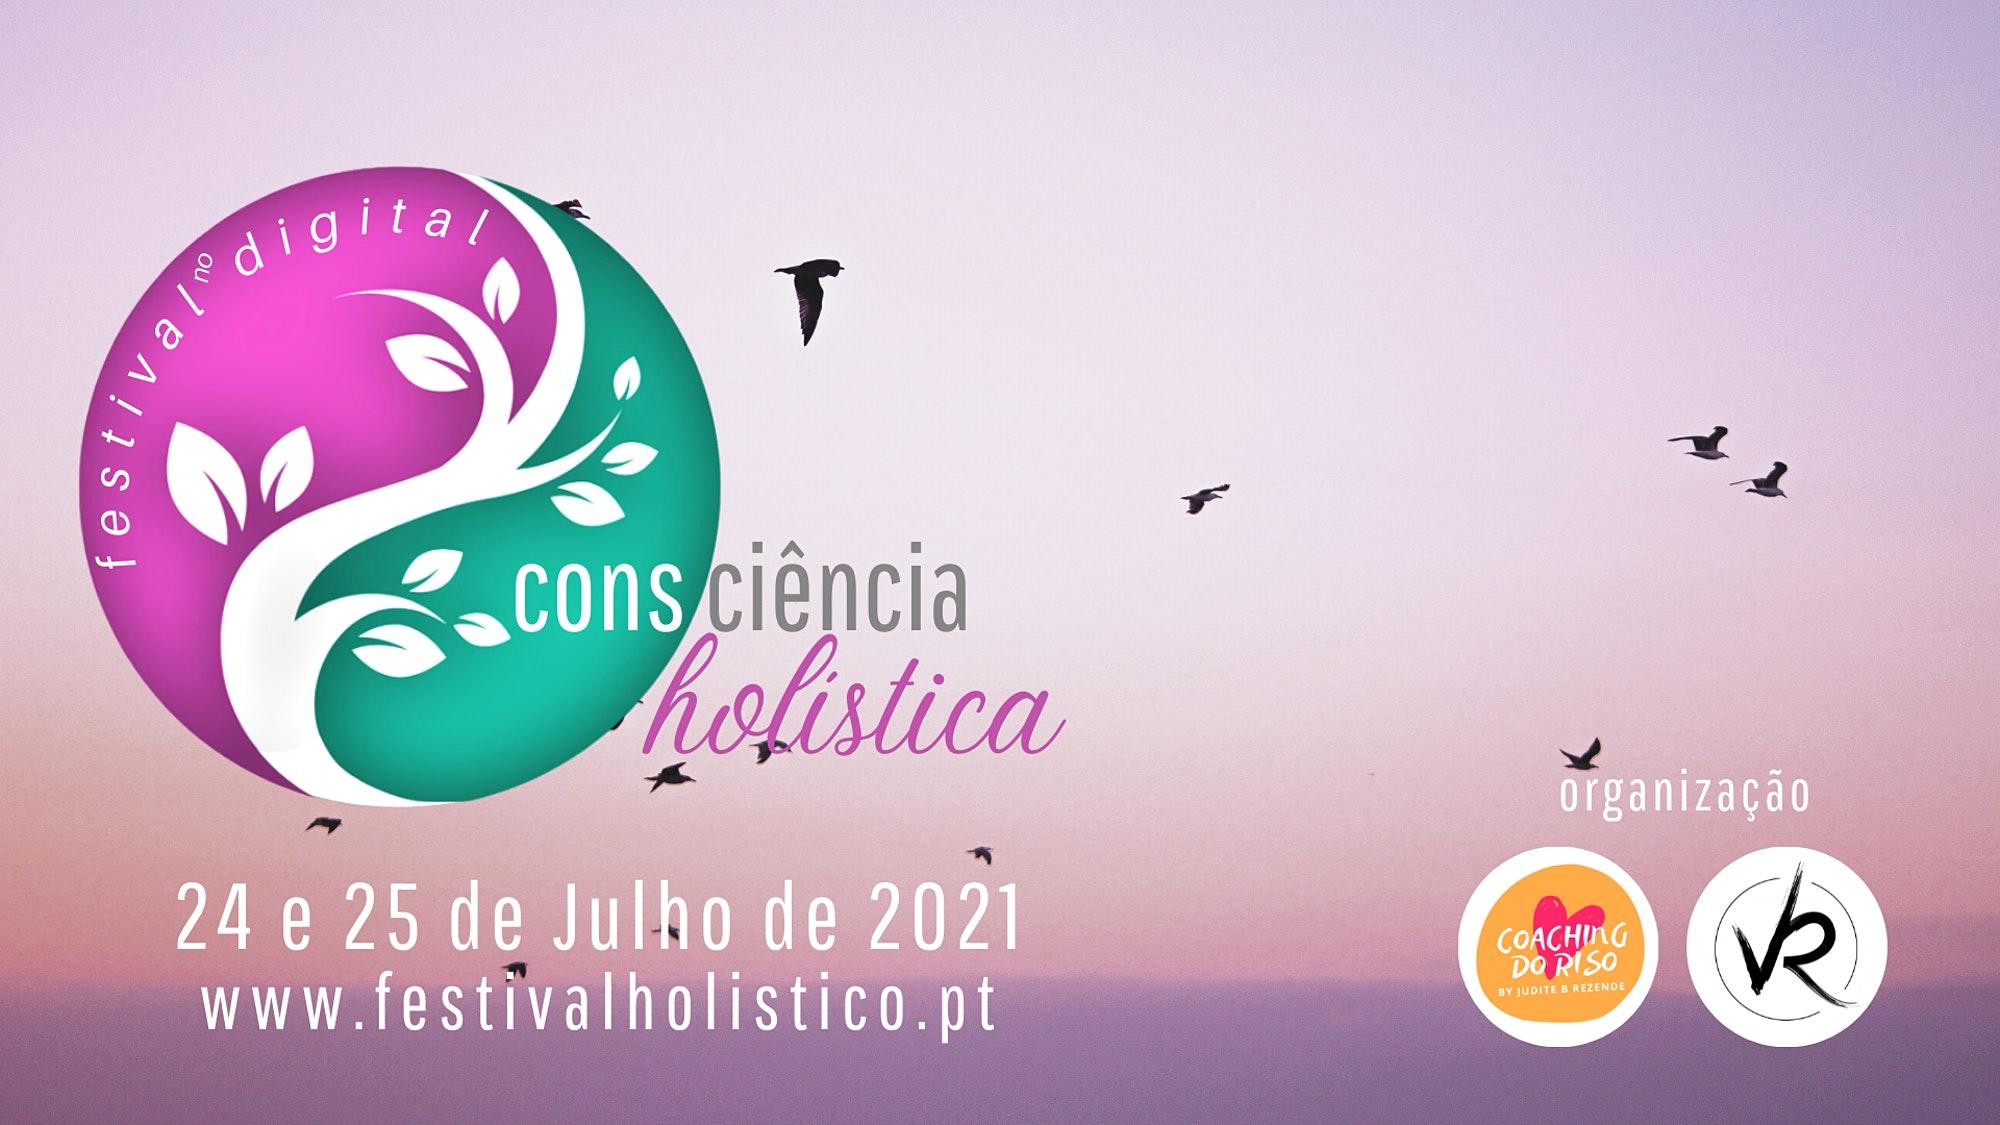 Consciência Holística - Festival Holístico no Digital